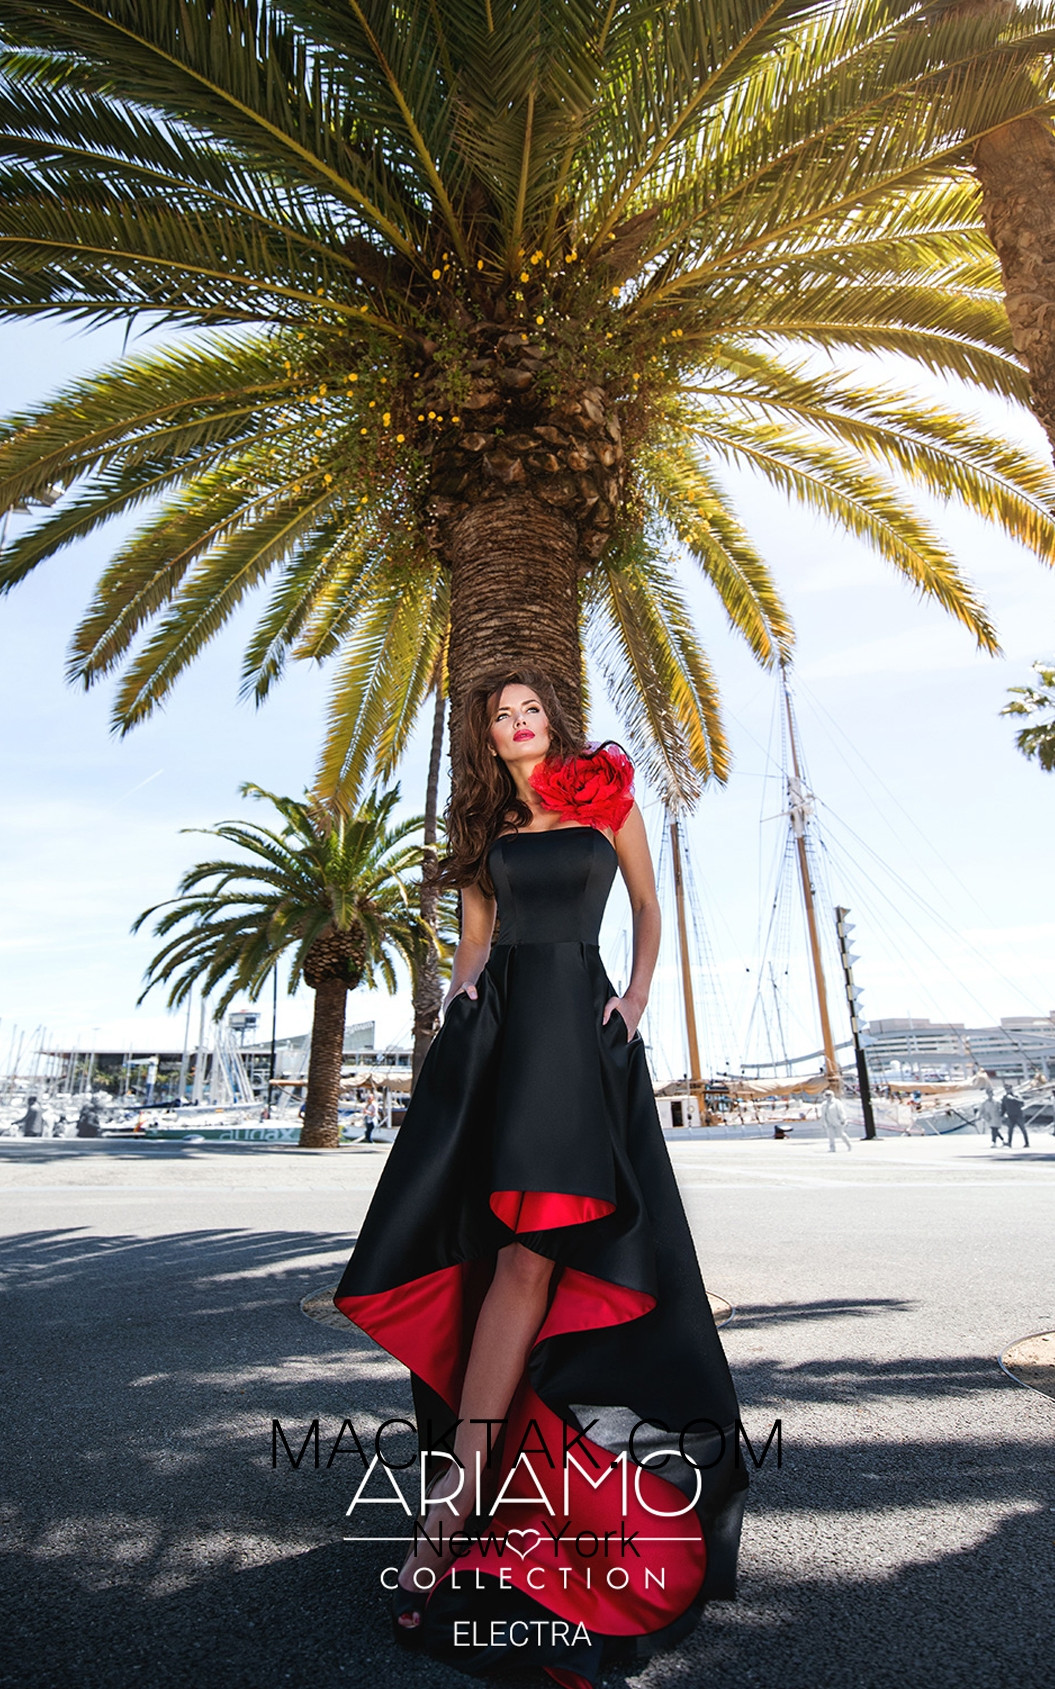 Ariamo Electra1 Front Dress